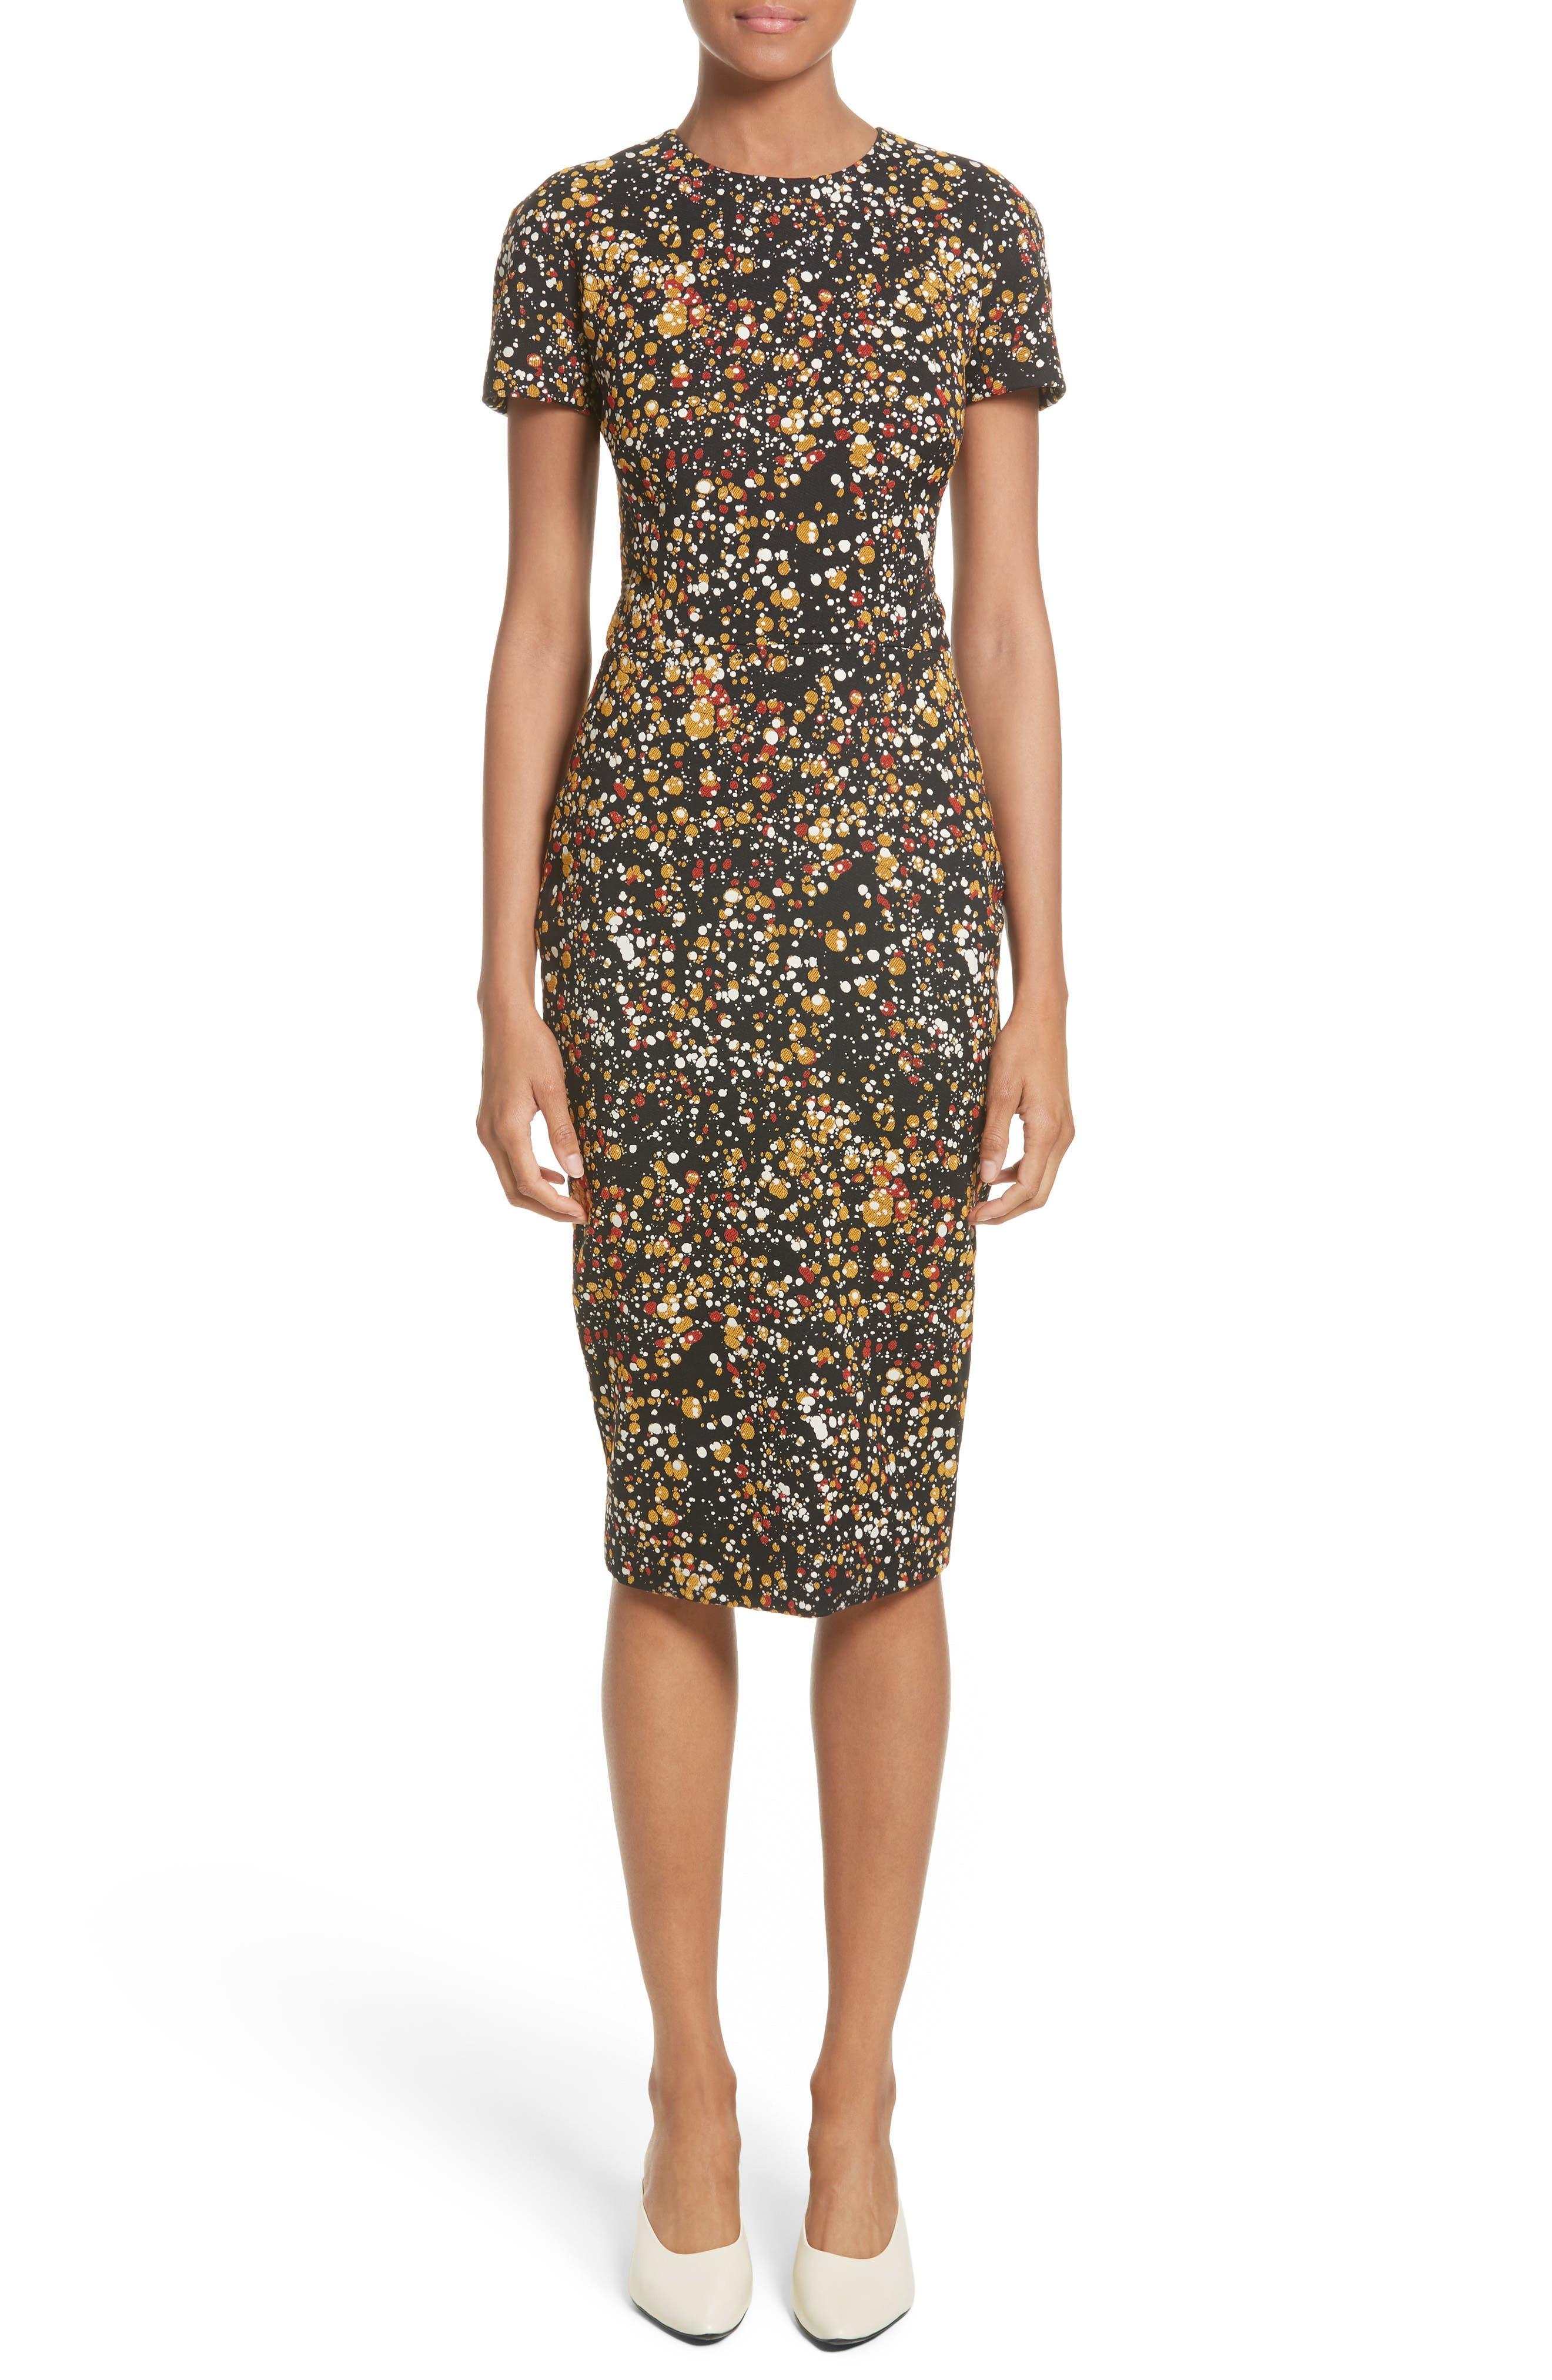 Main Image - Victoria Beckham Marble Jacquard Dress